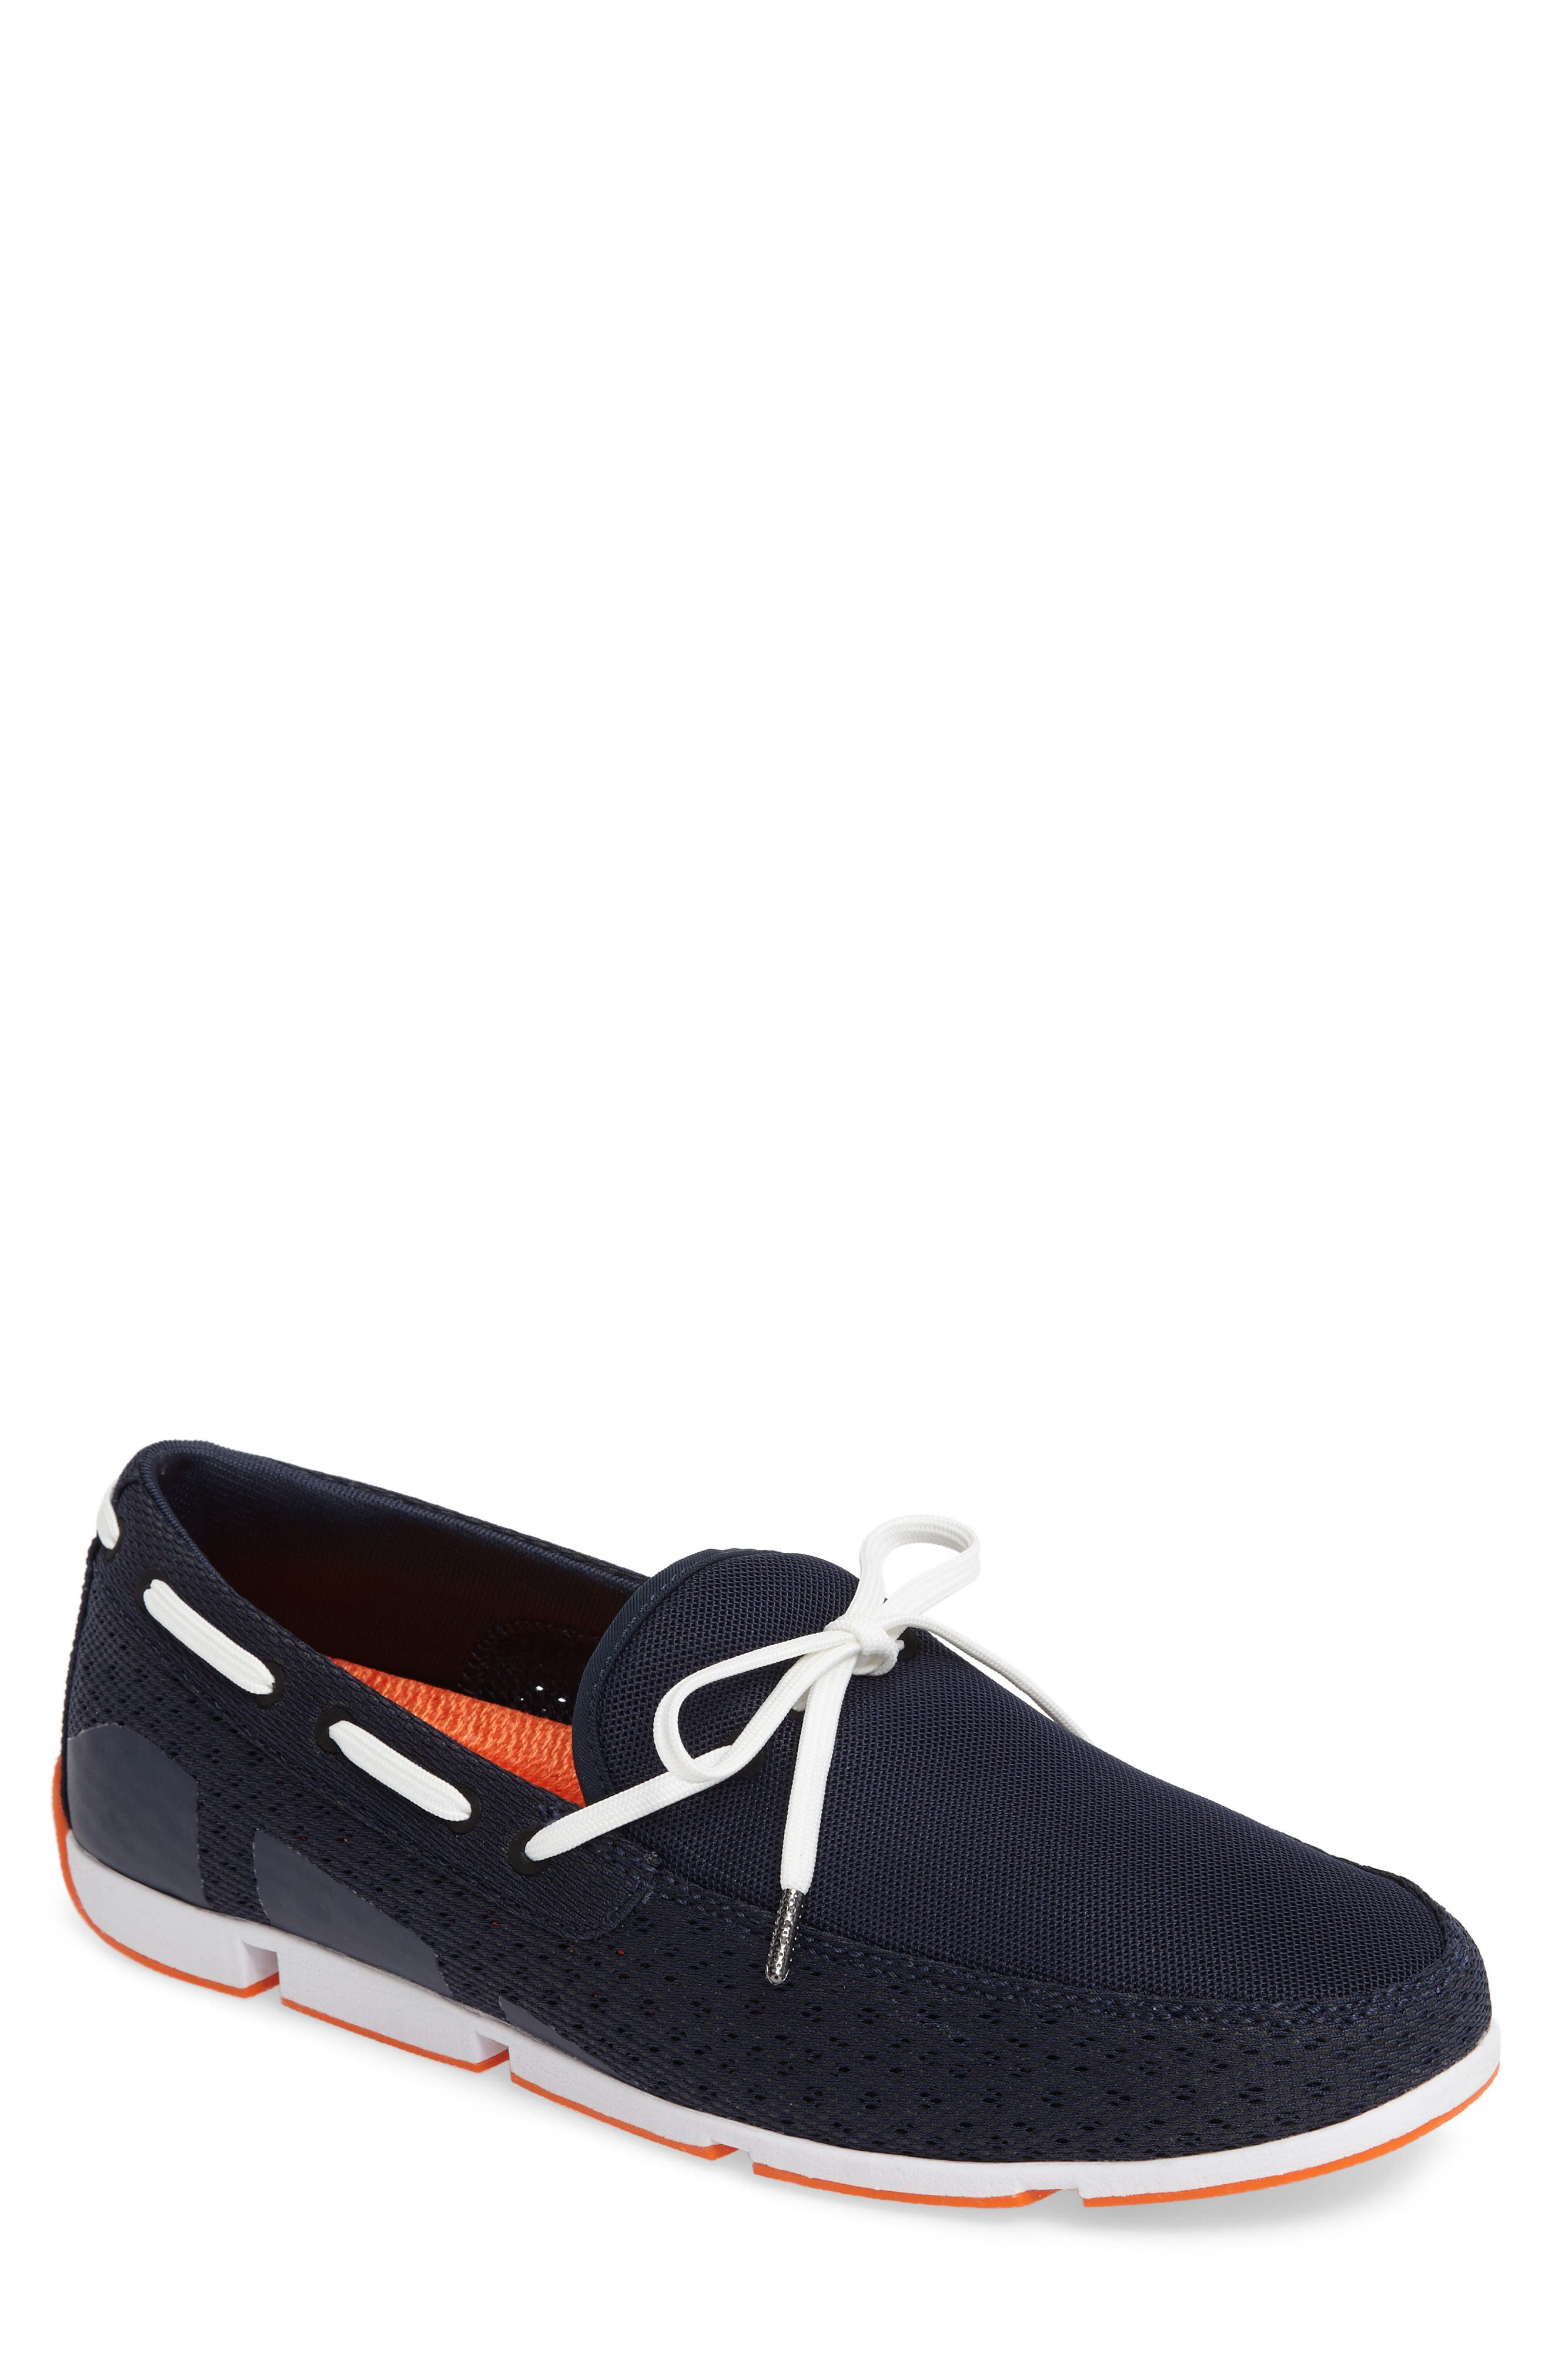 'Breeze' Slip-On,                         Main,                         color, Navy/Navy